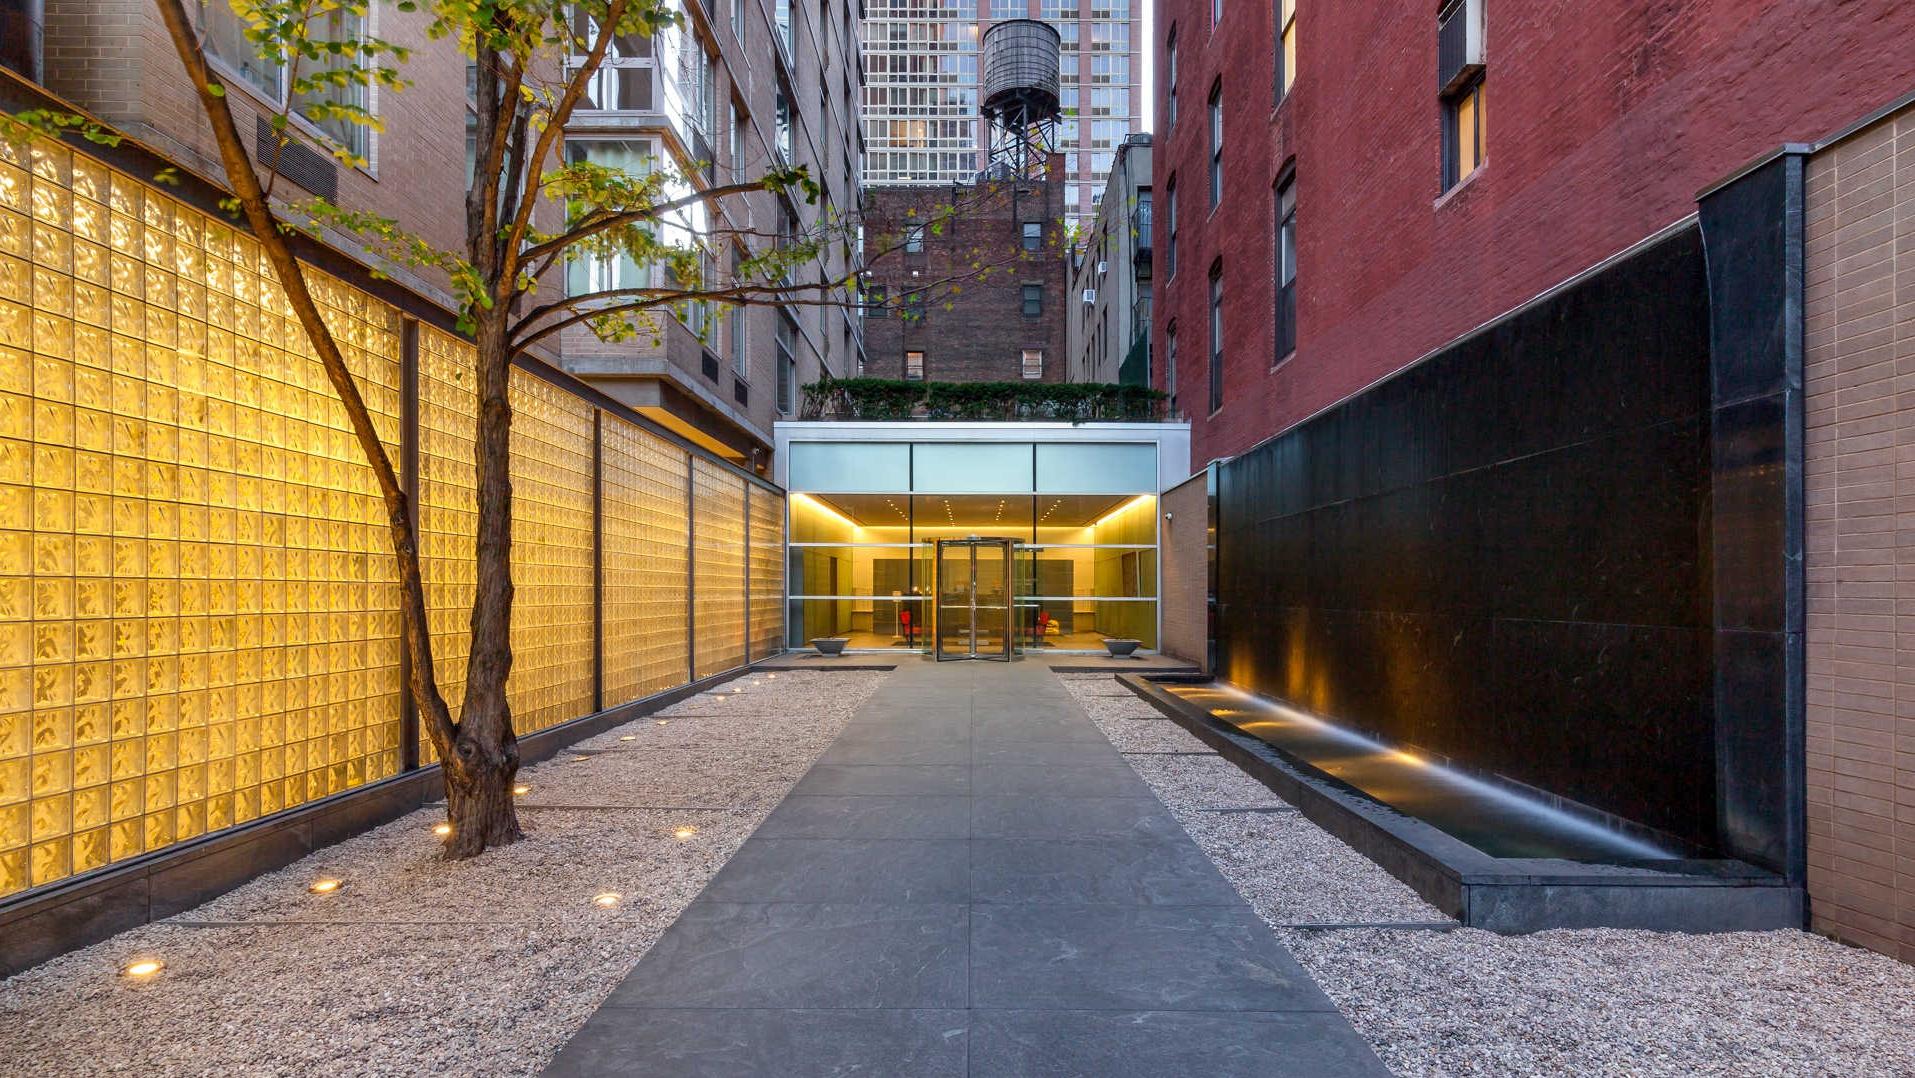 777 Sixth Avenue, NYC - Rental Apartments